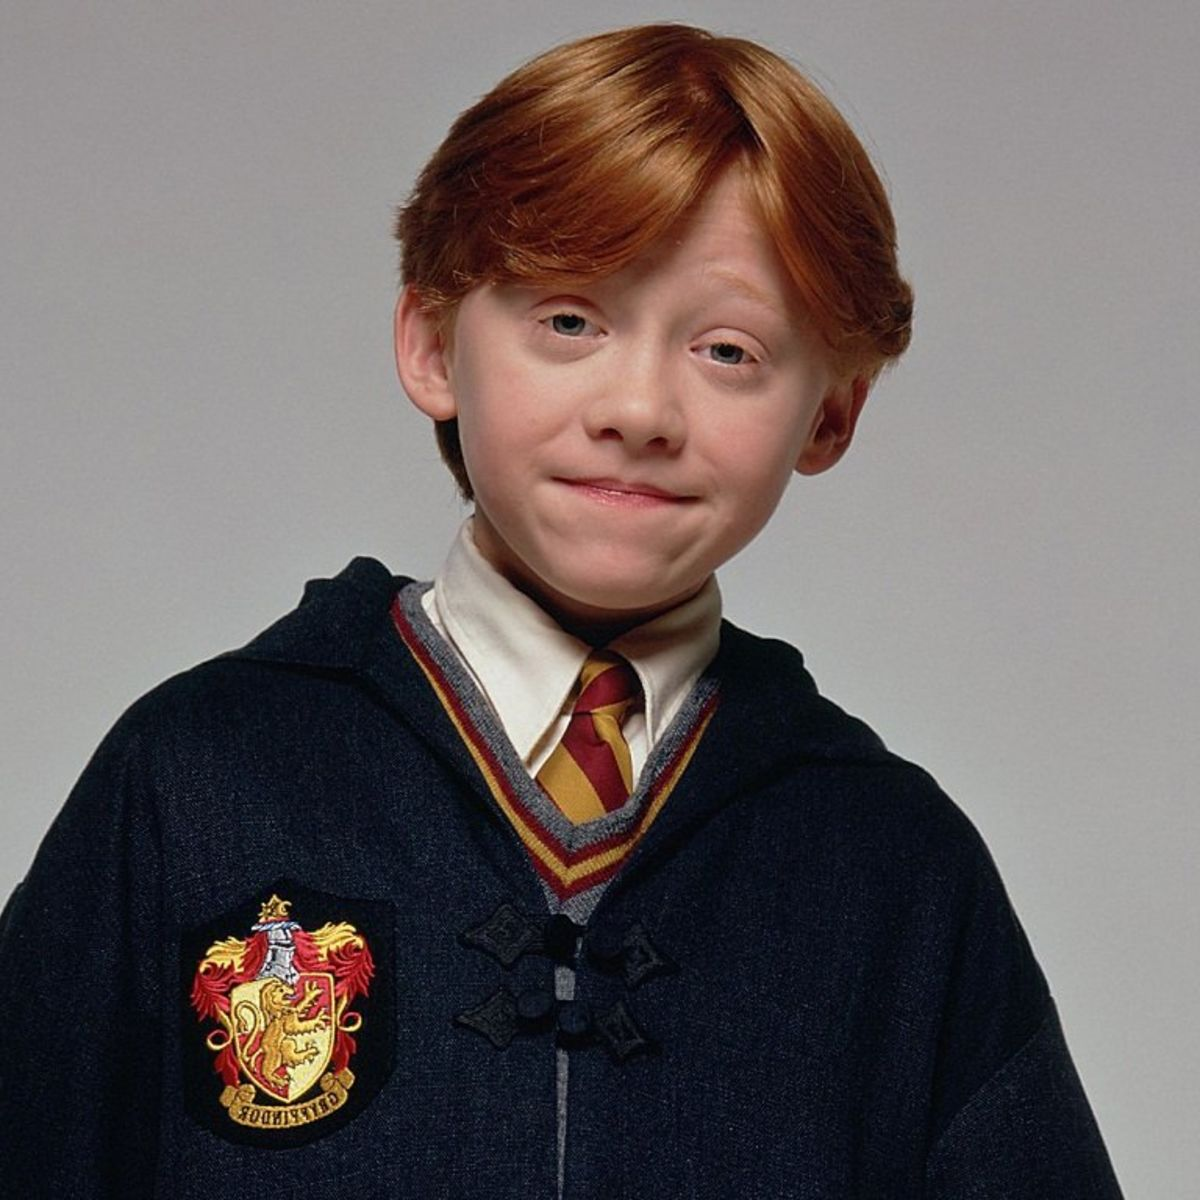 Ron-Weasley.jpg